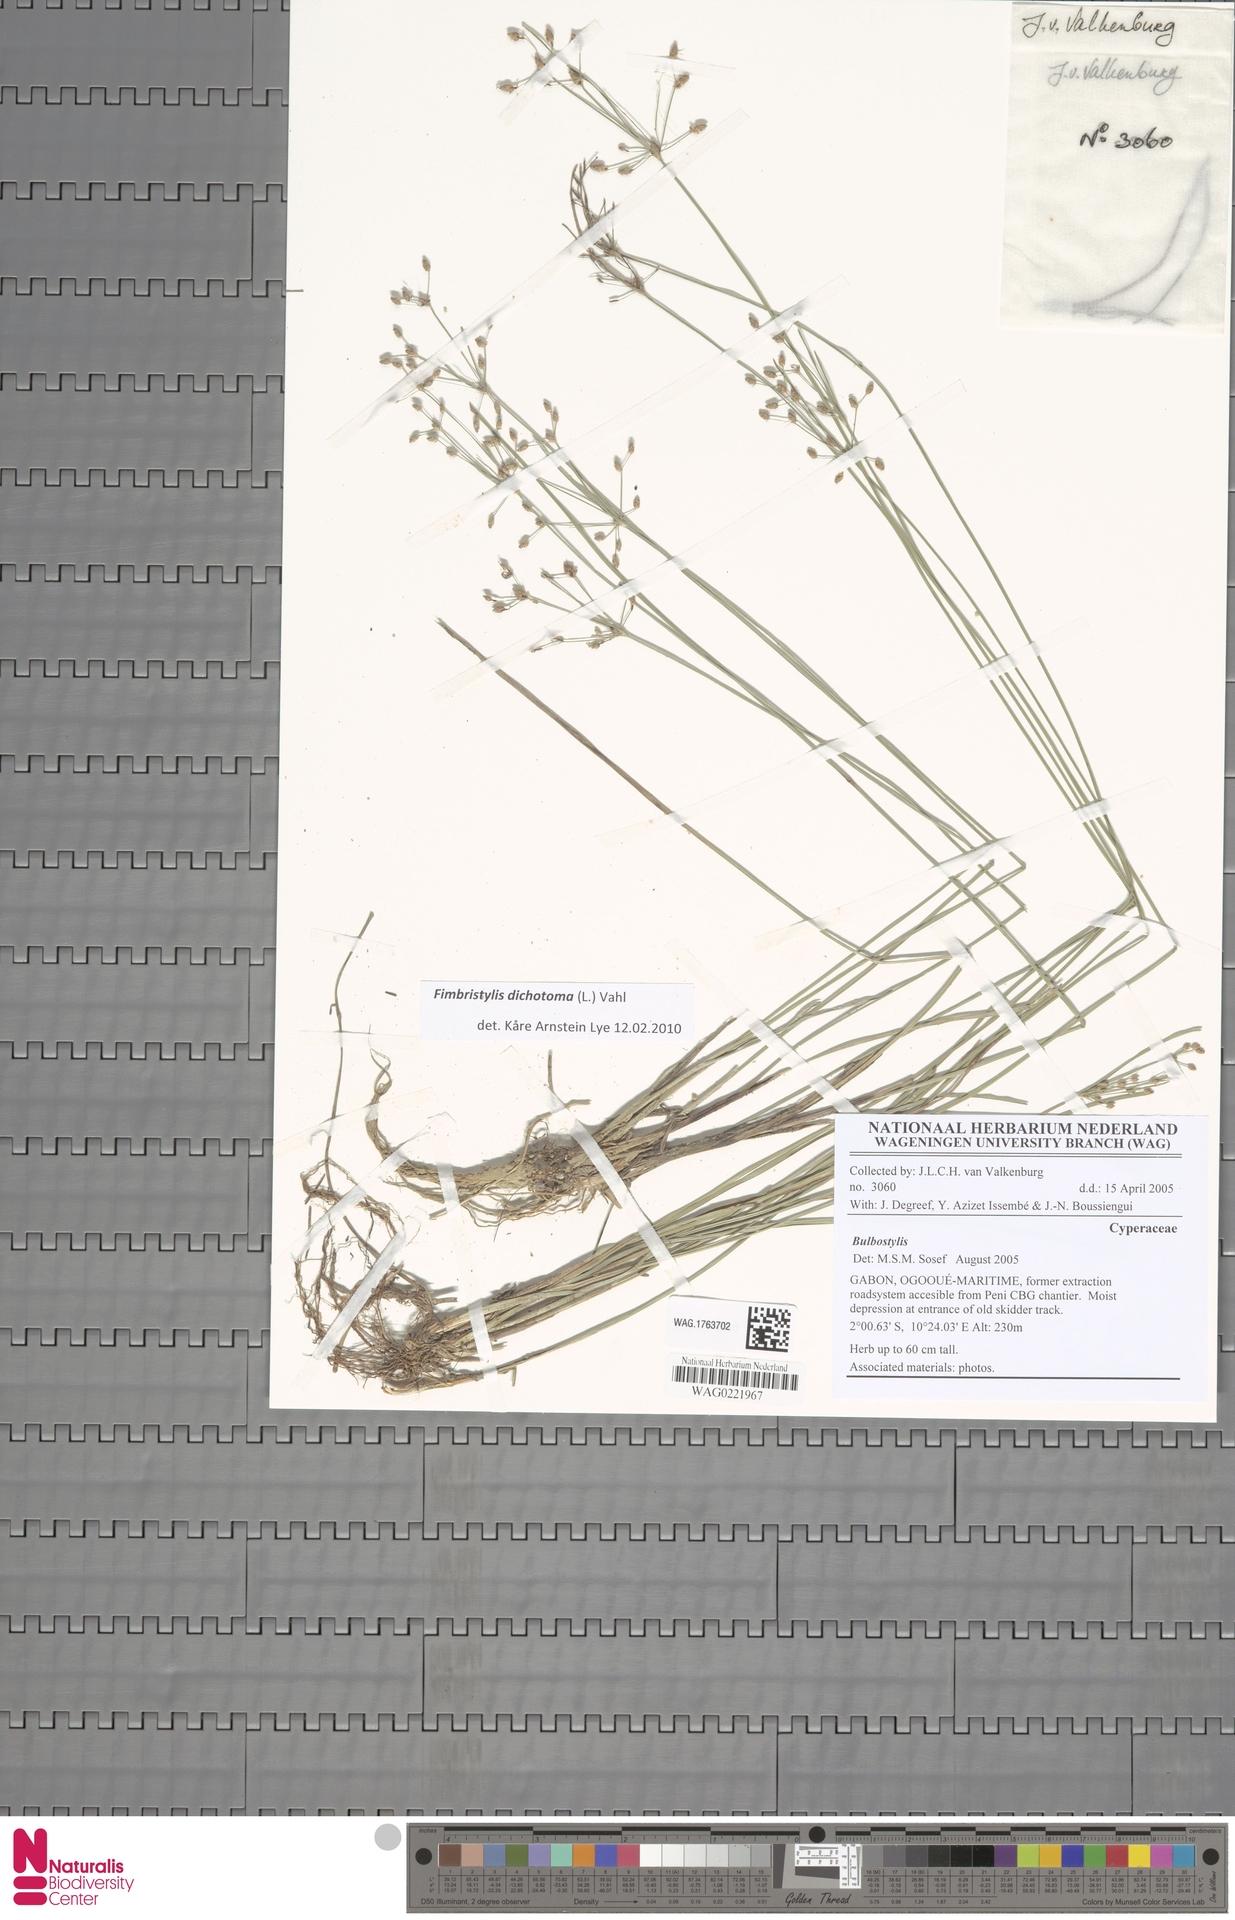 WAG.1763702 | Fimbristylis dichotoma (L.) Vahl